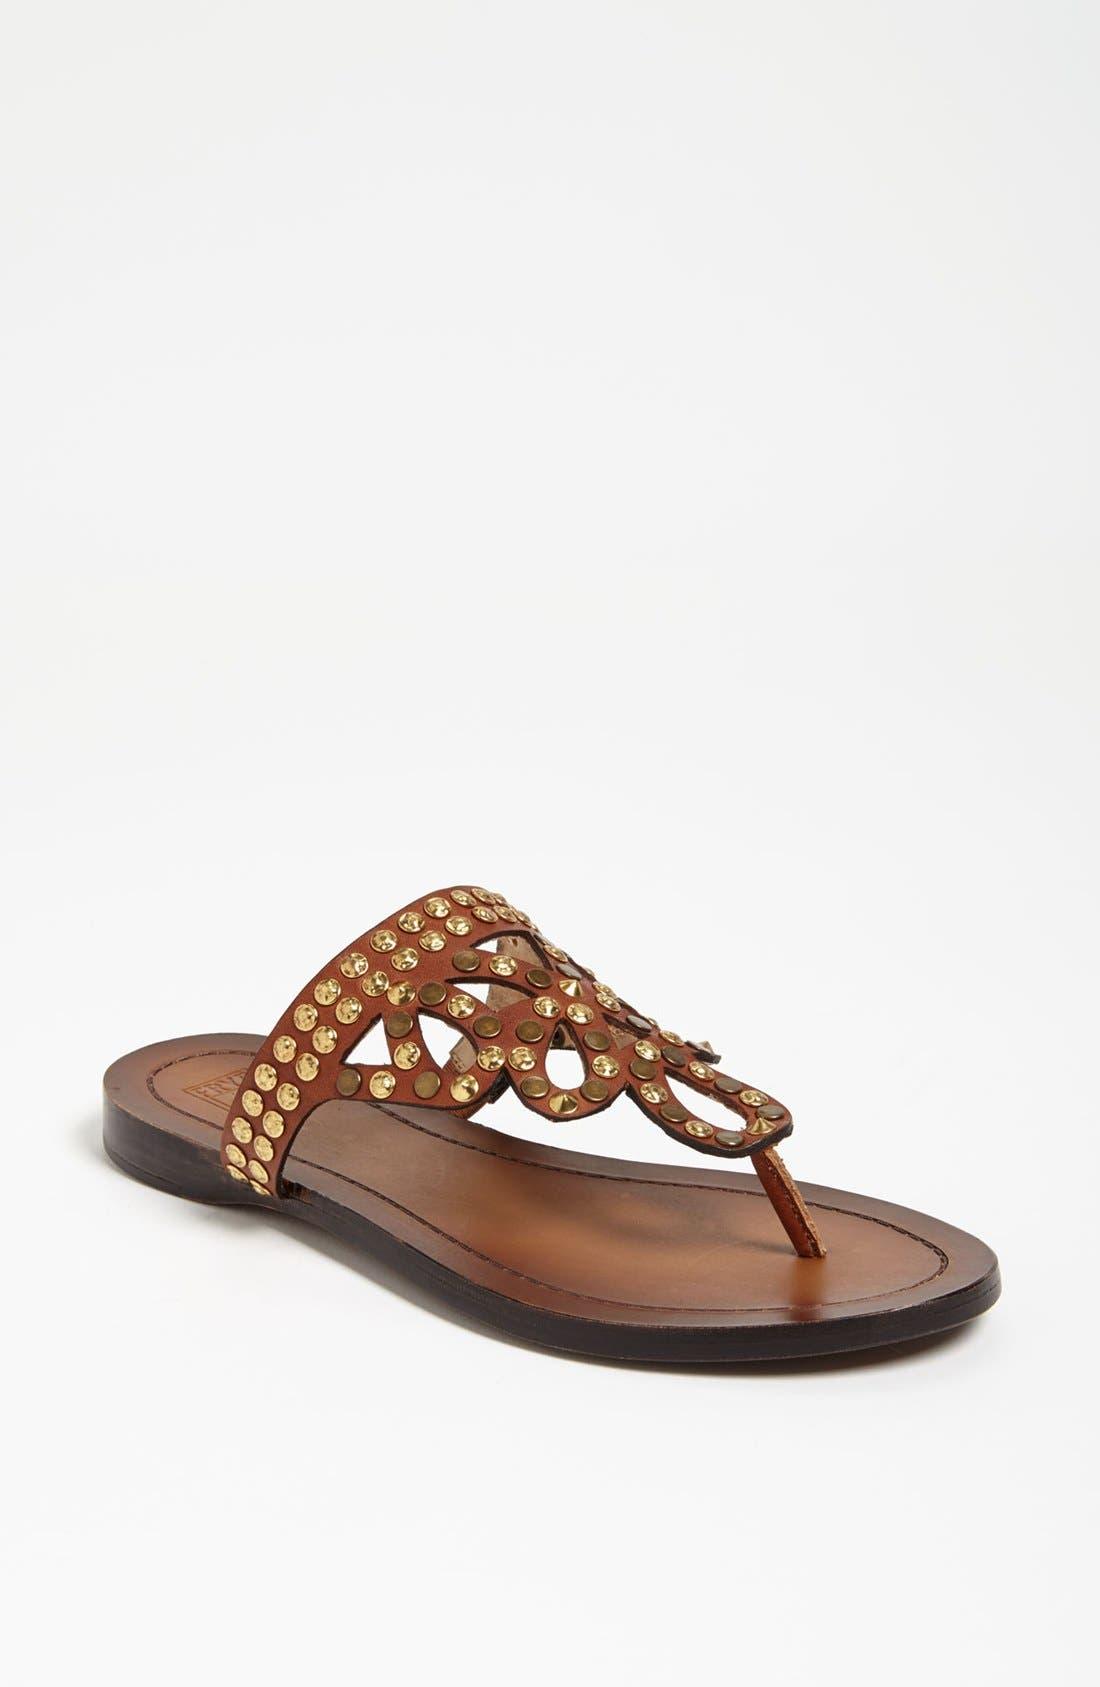 Main Image - Frye 'Rachel' Sandal